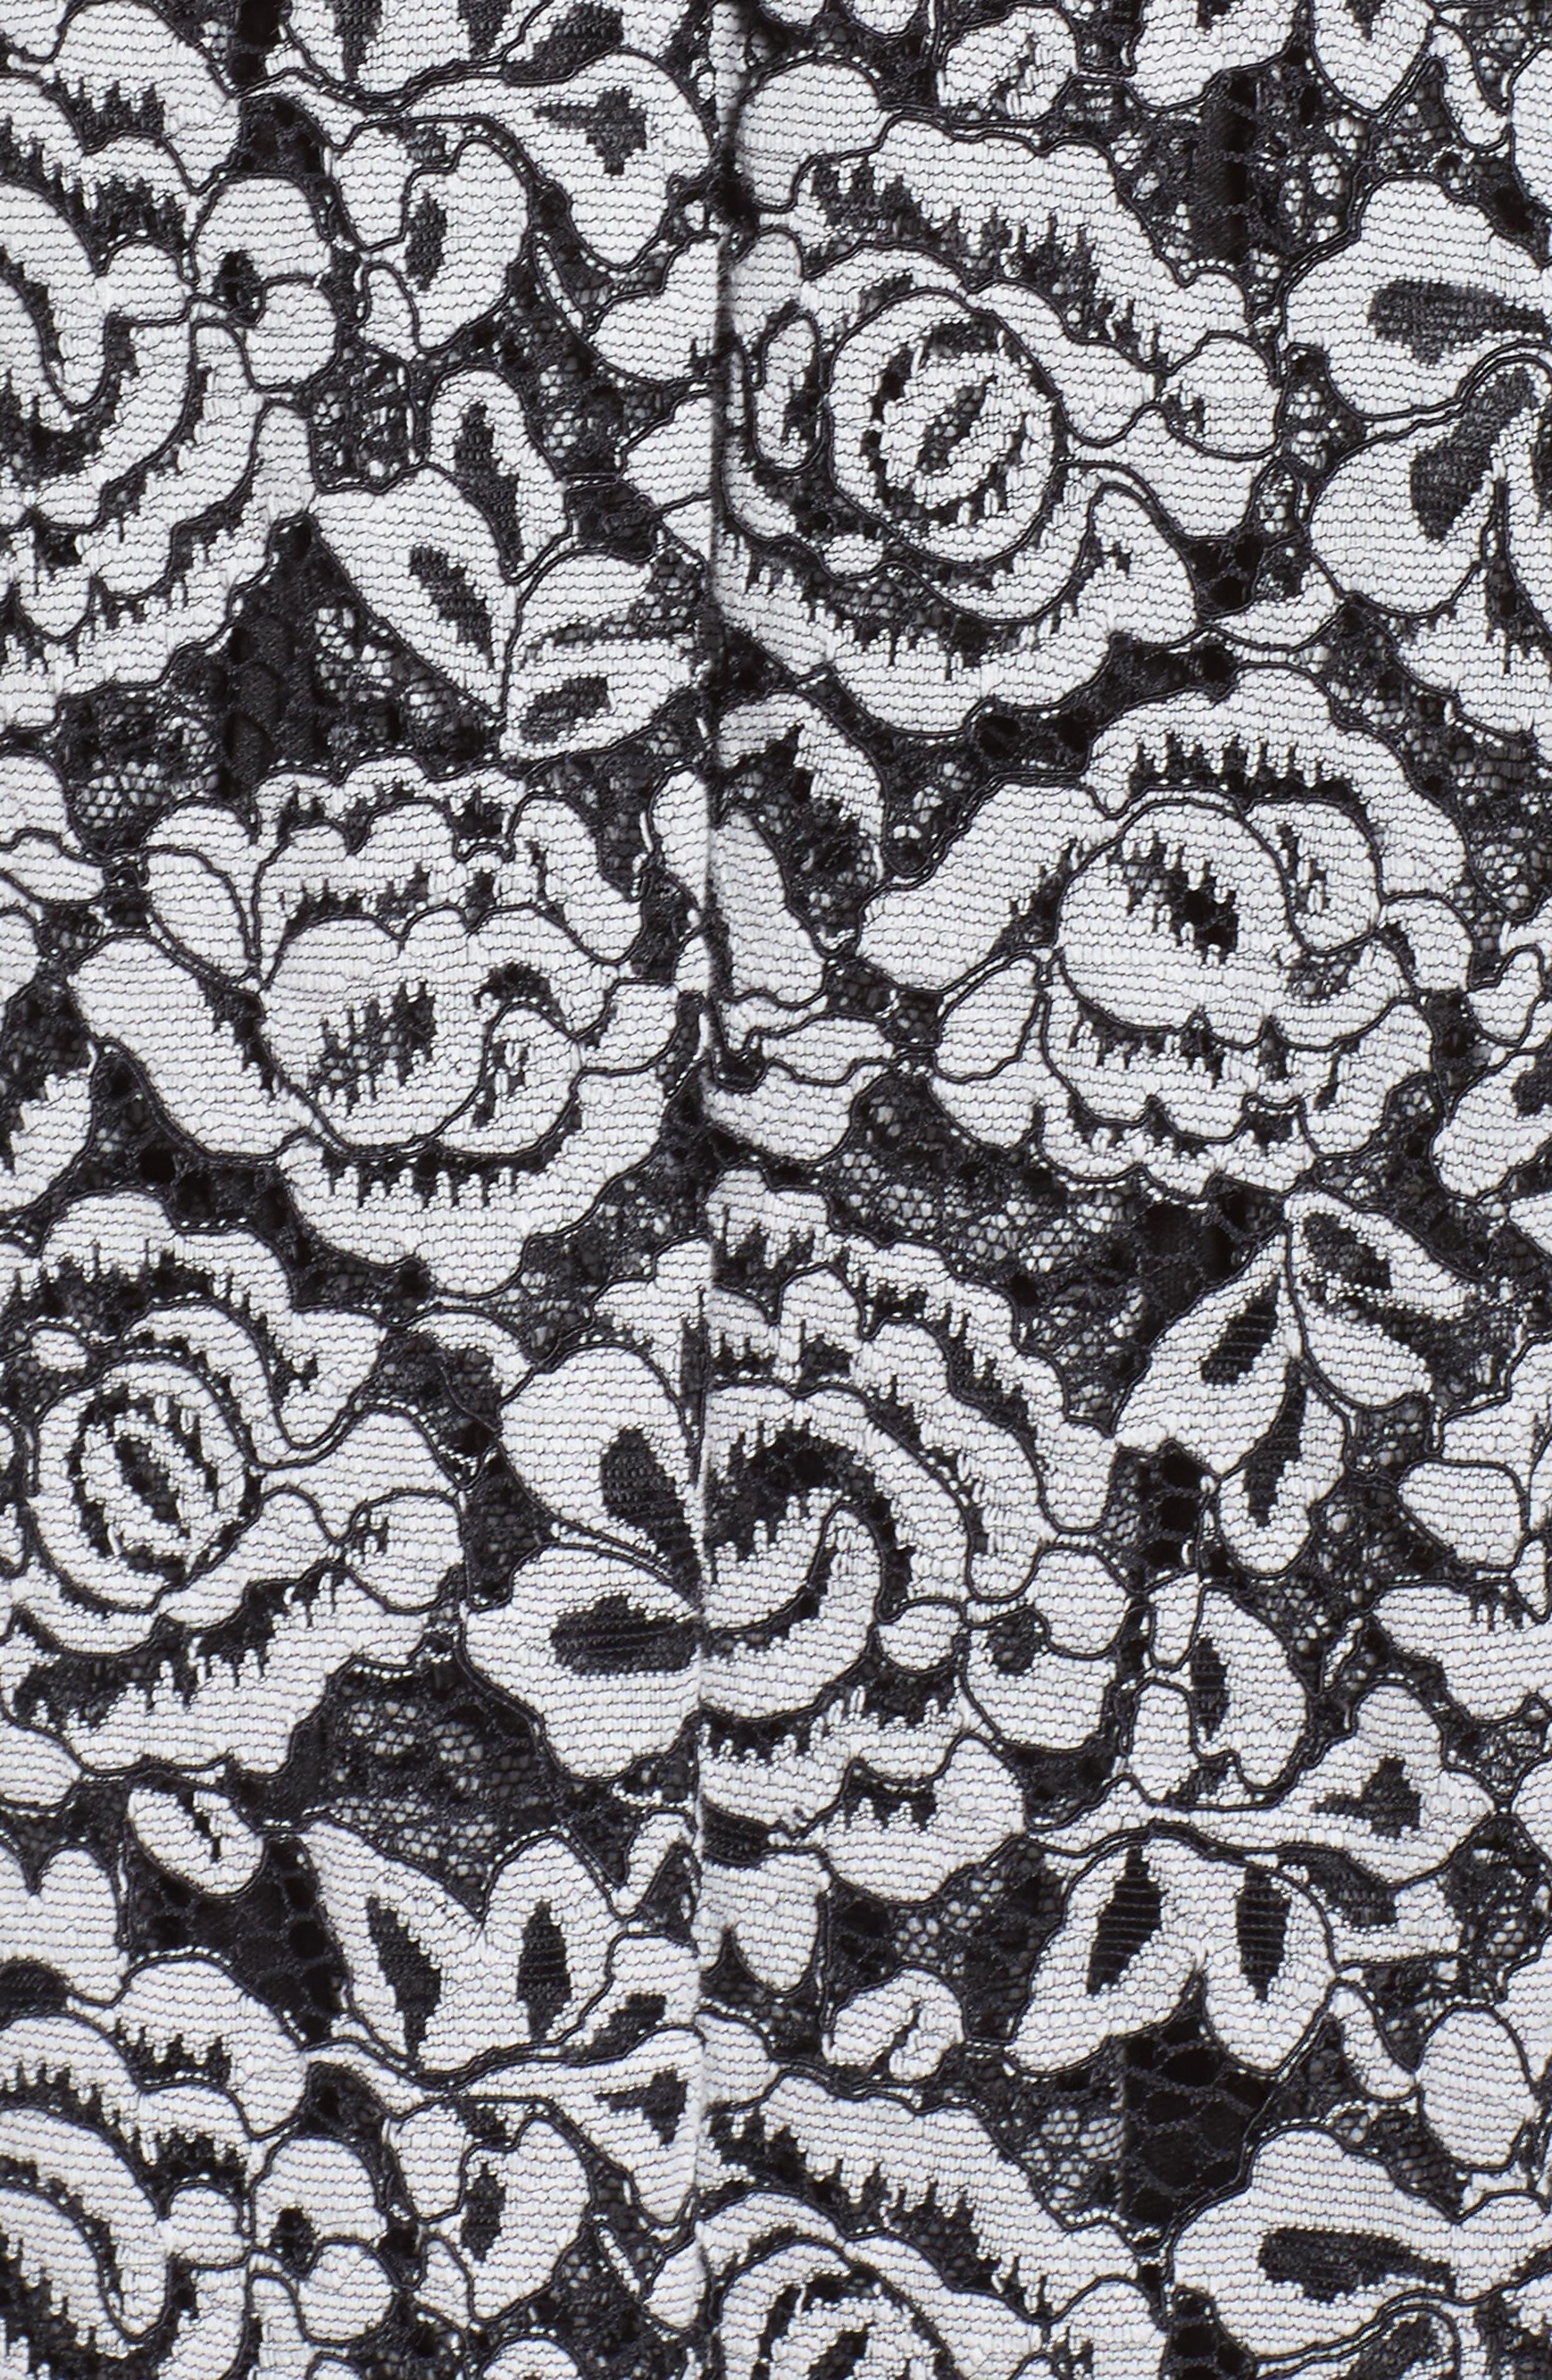 Lace Fit & Flare Dress,                             Alternate thumbnail 5, color,                             Black/ White